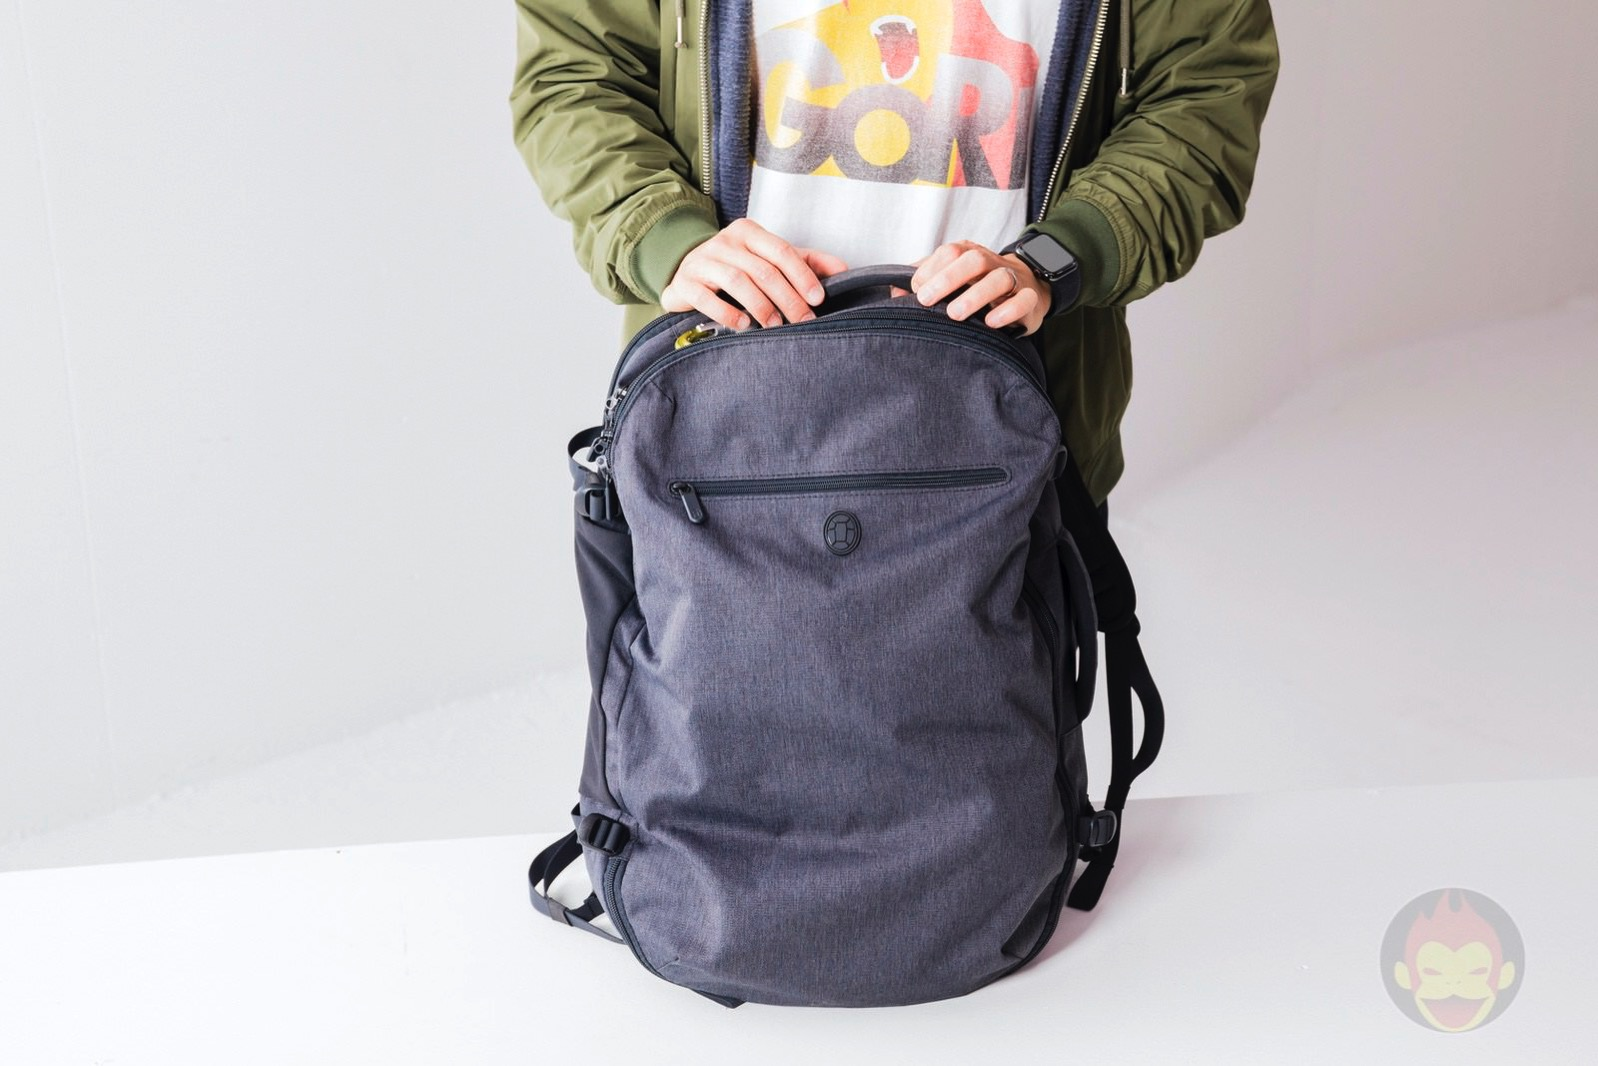 Tortuga-Setout-Backpack-35liter-review-11.jpg